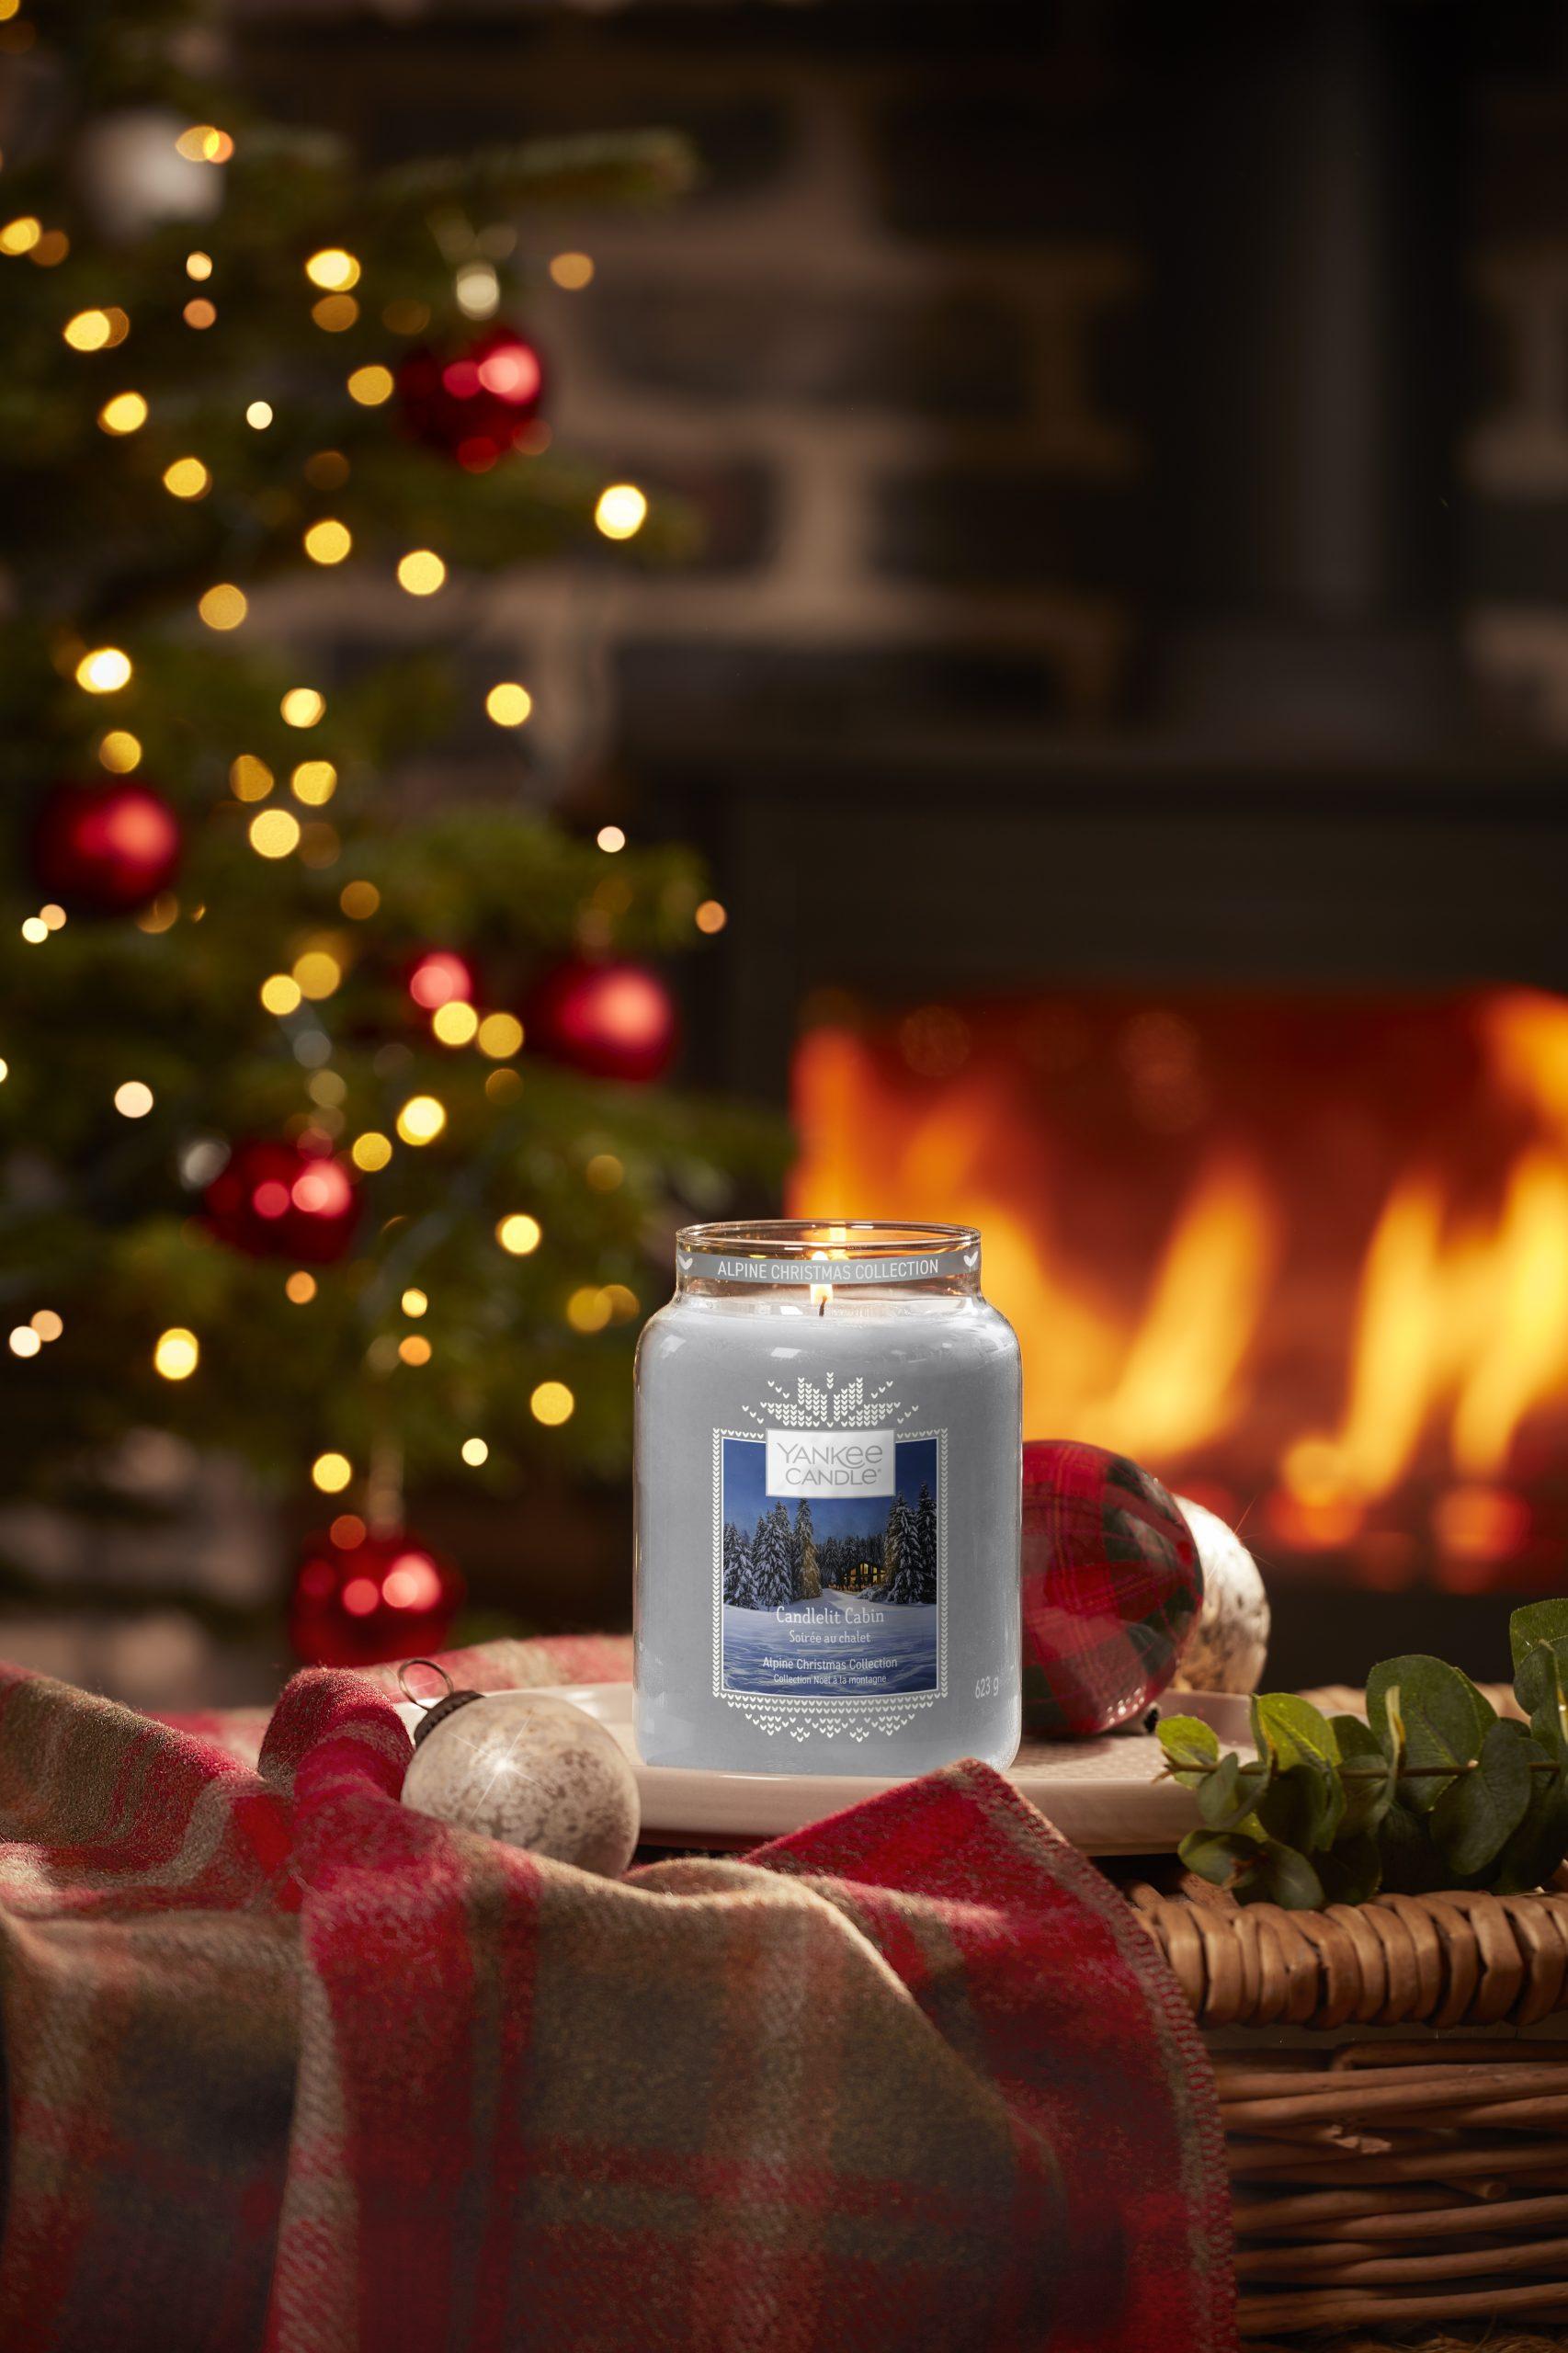 Yankee Fireplace Luxury Yankee Candle Has Released Its Christmas Range and We Need